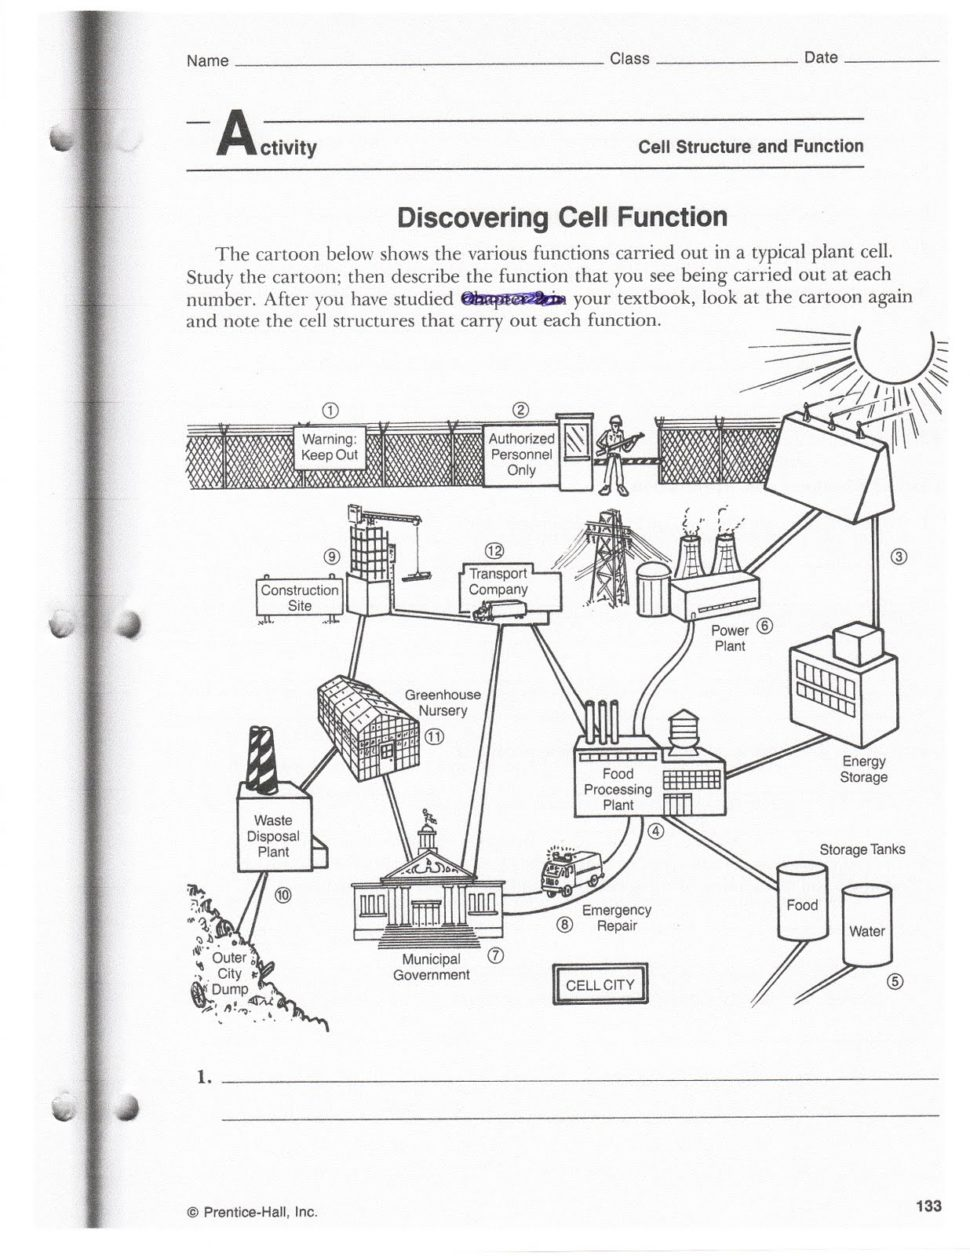 Worksheet  Cell Analogy Worksheet  Thedanks Worksheet For Everyone